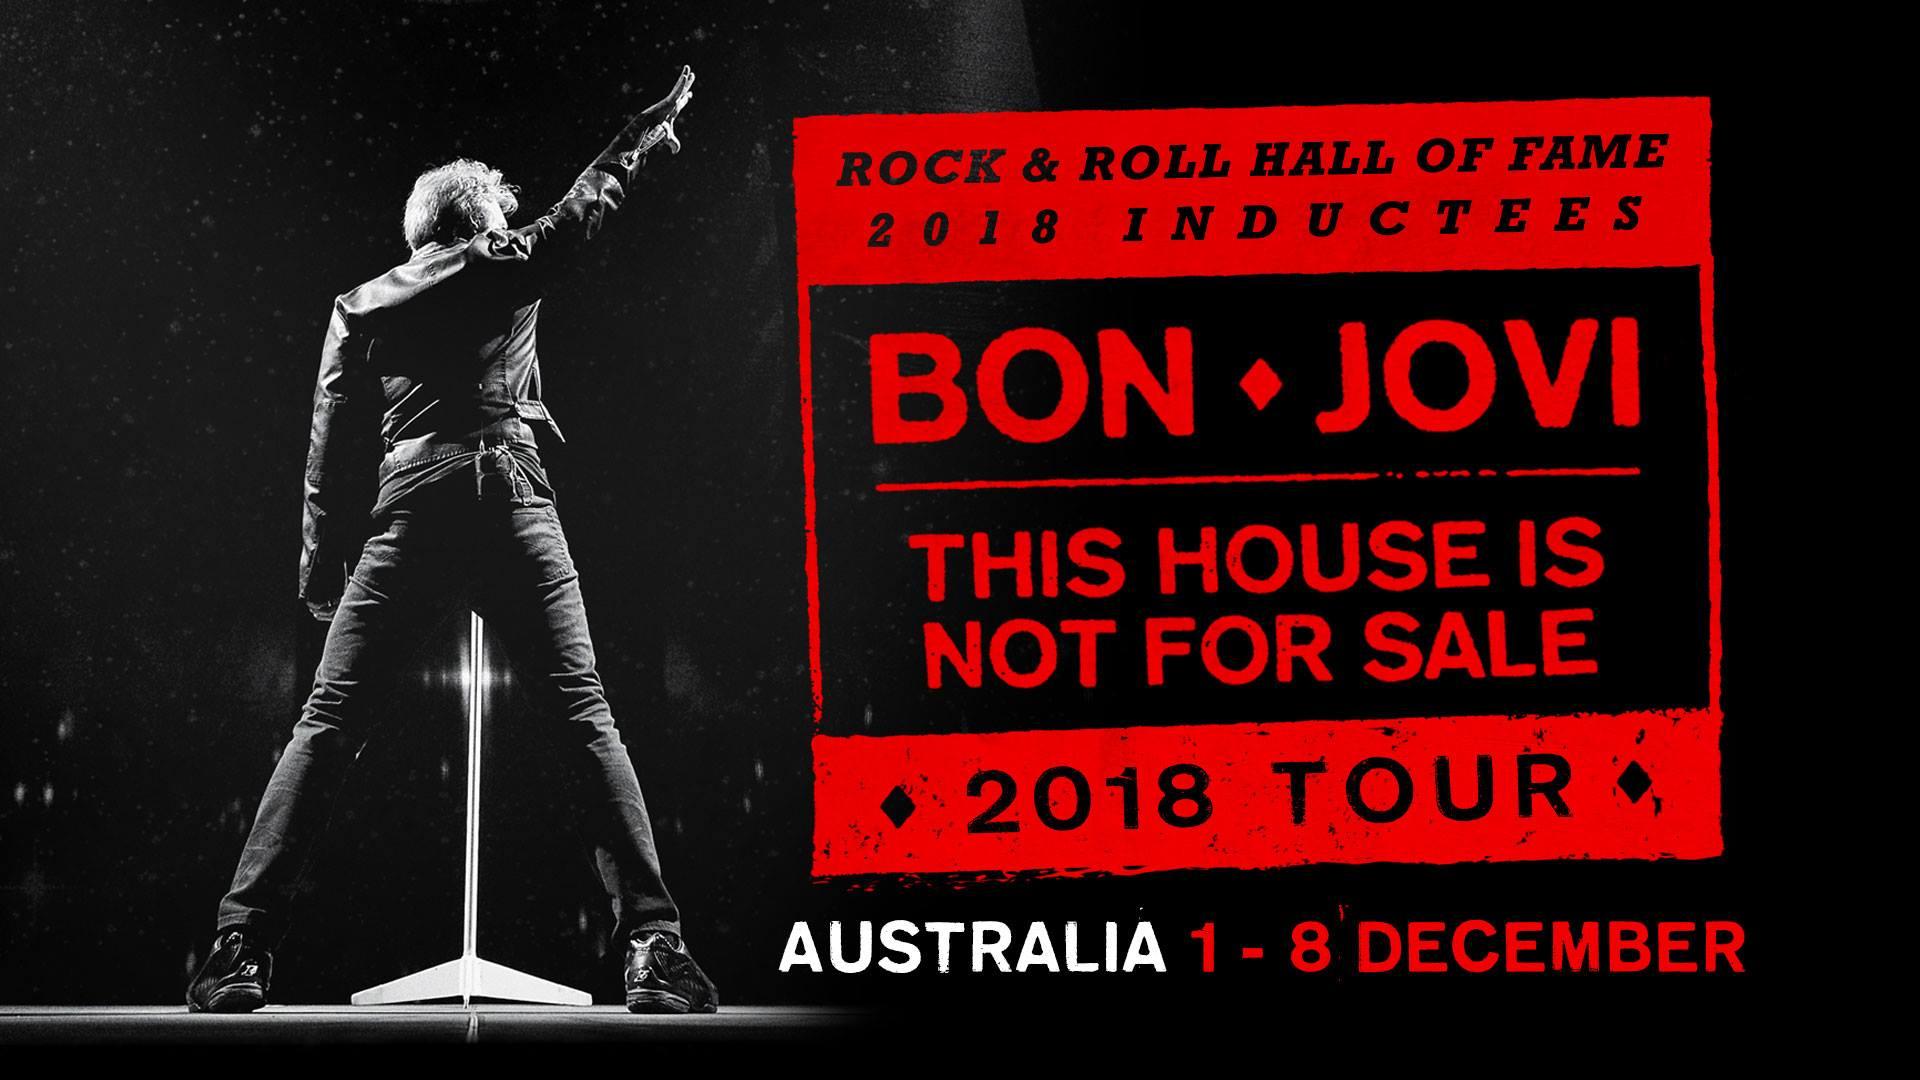 Bon Jovi Australian Tour, December 2018